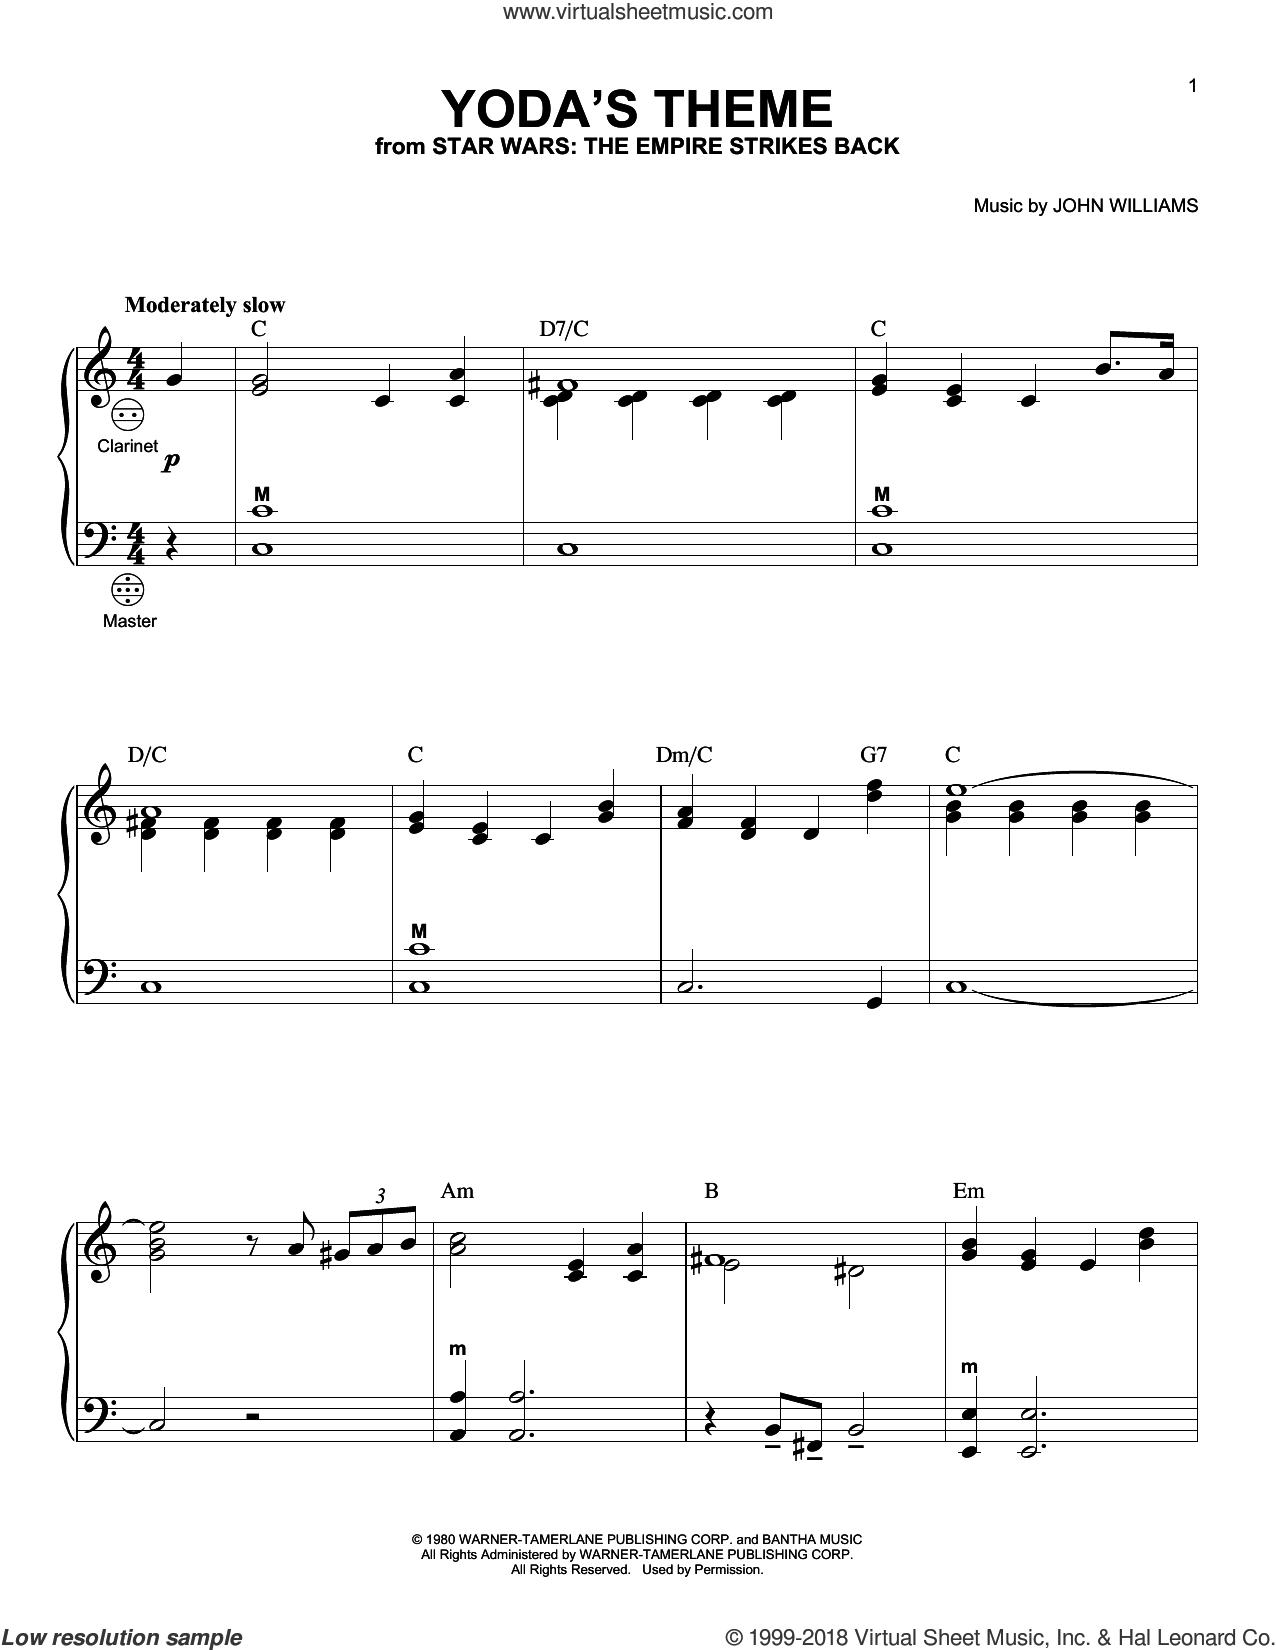 Yoda's Theme sheet music for accordion by John Williams, intermediate skill level